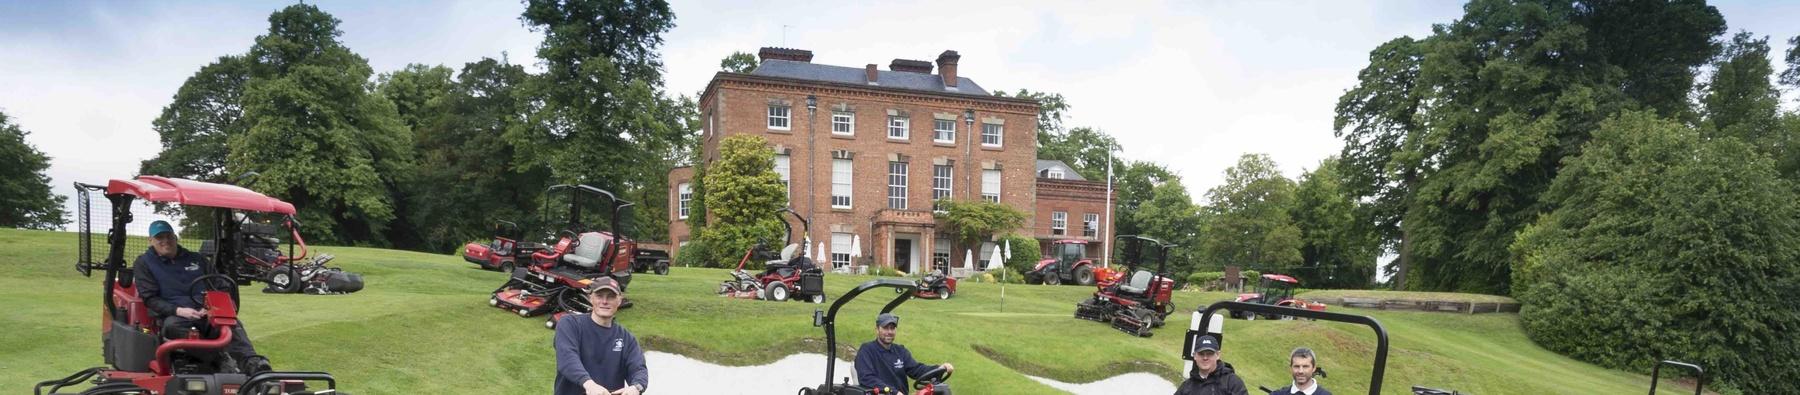 Toro cropEdgbaston Golf Club